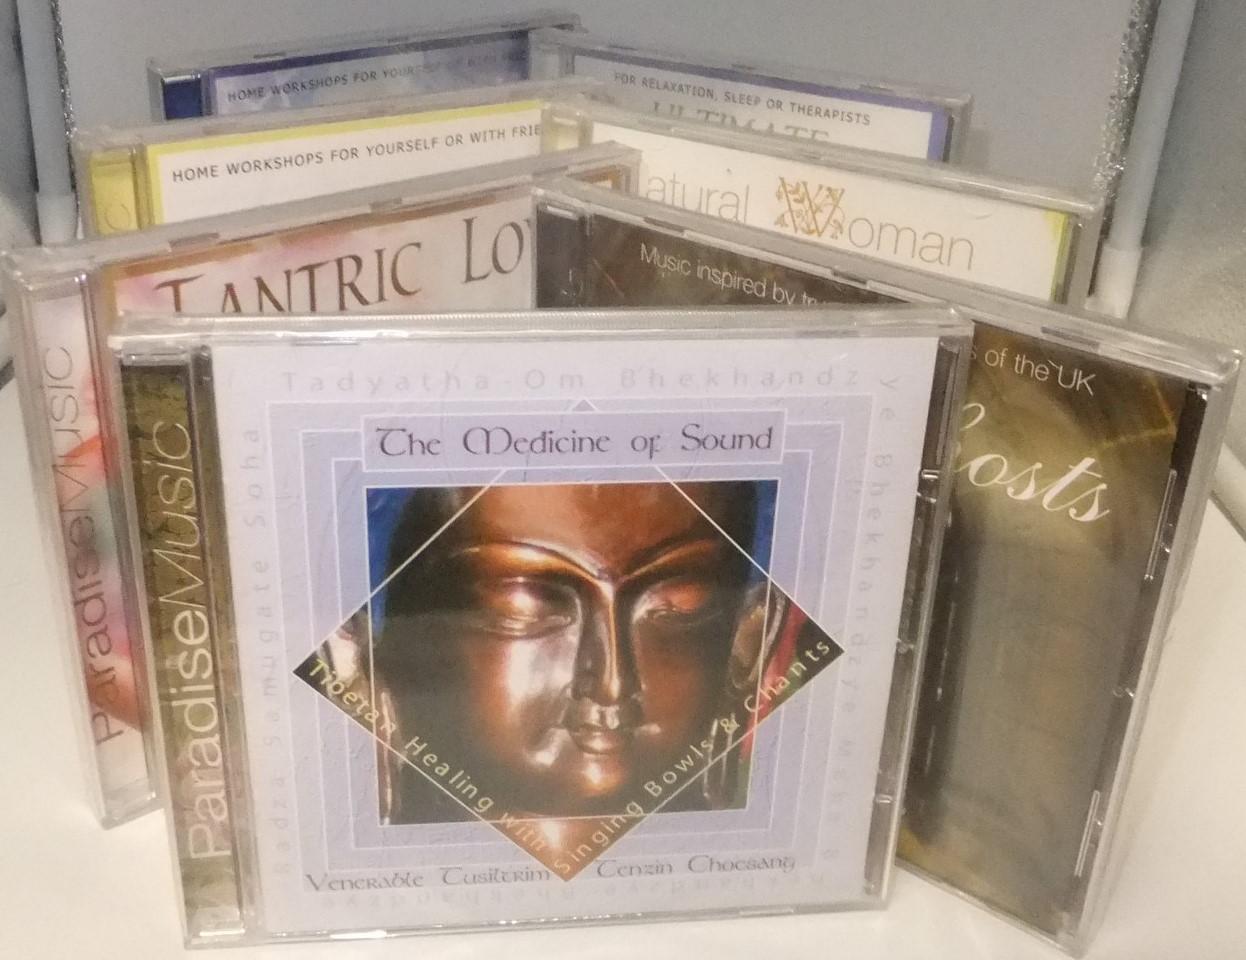 Paradise Music CDs